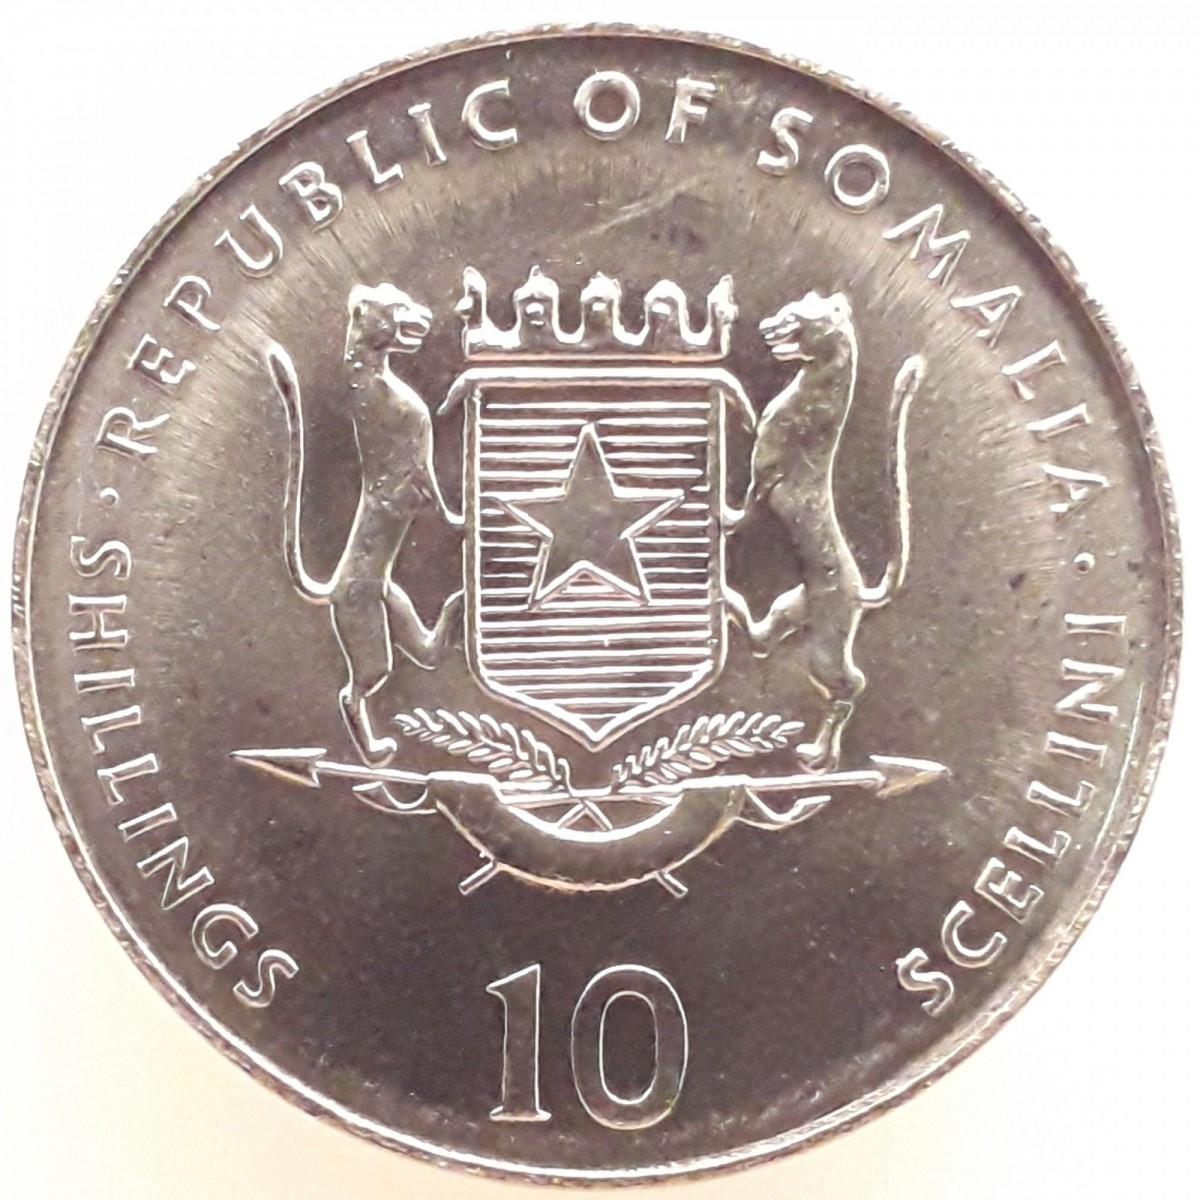 Сомали 10 шиллингов 2000 года - год Козы код 22626